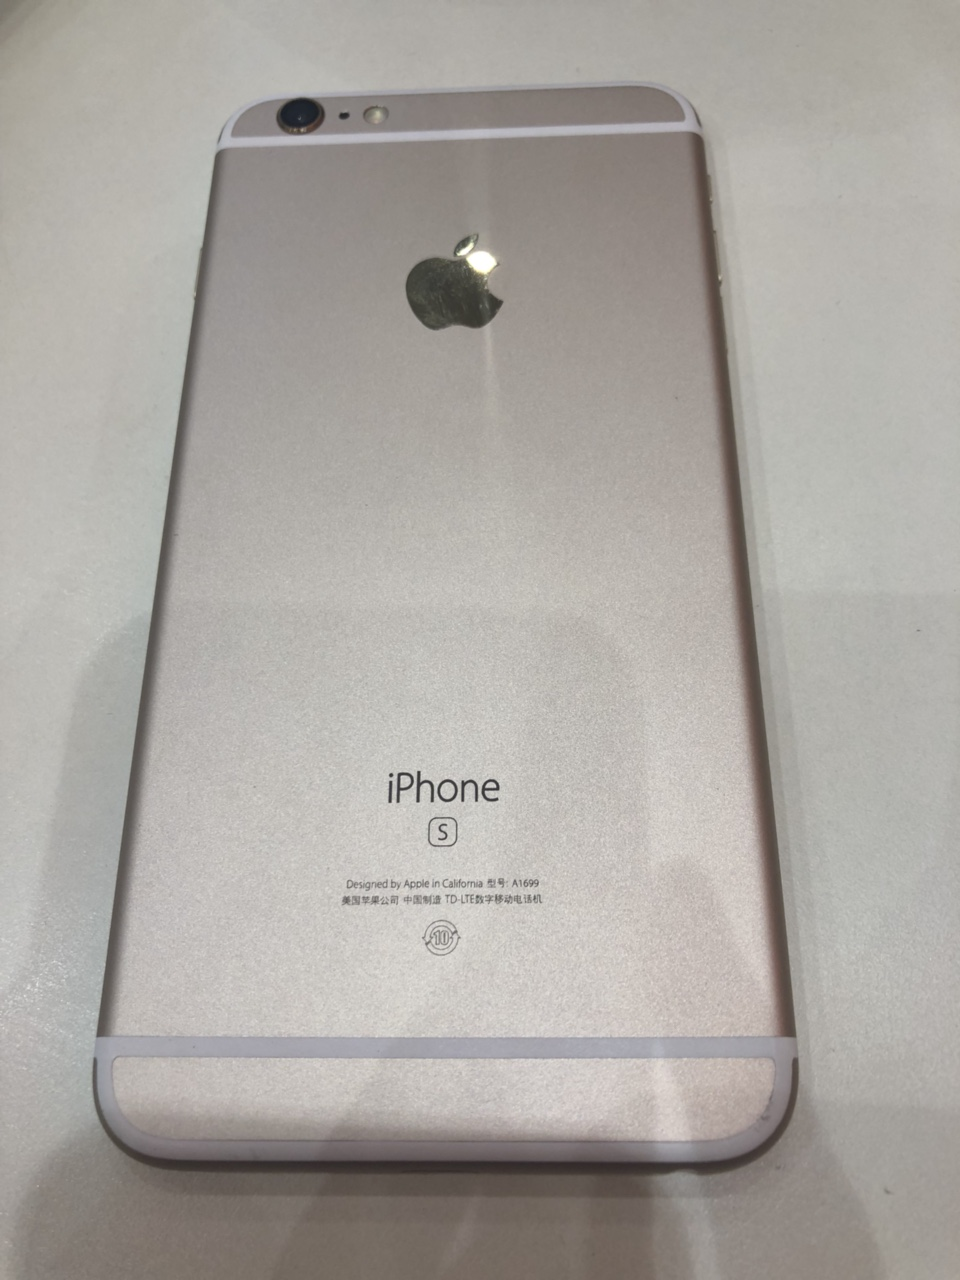 iPhone6s 国行三网通用 自己用的手机 现在低价甩了 16g 要的联系我